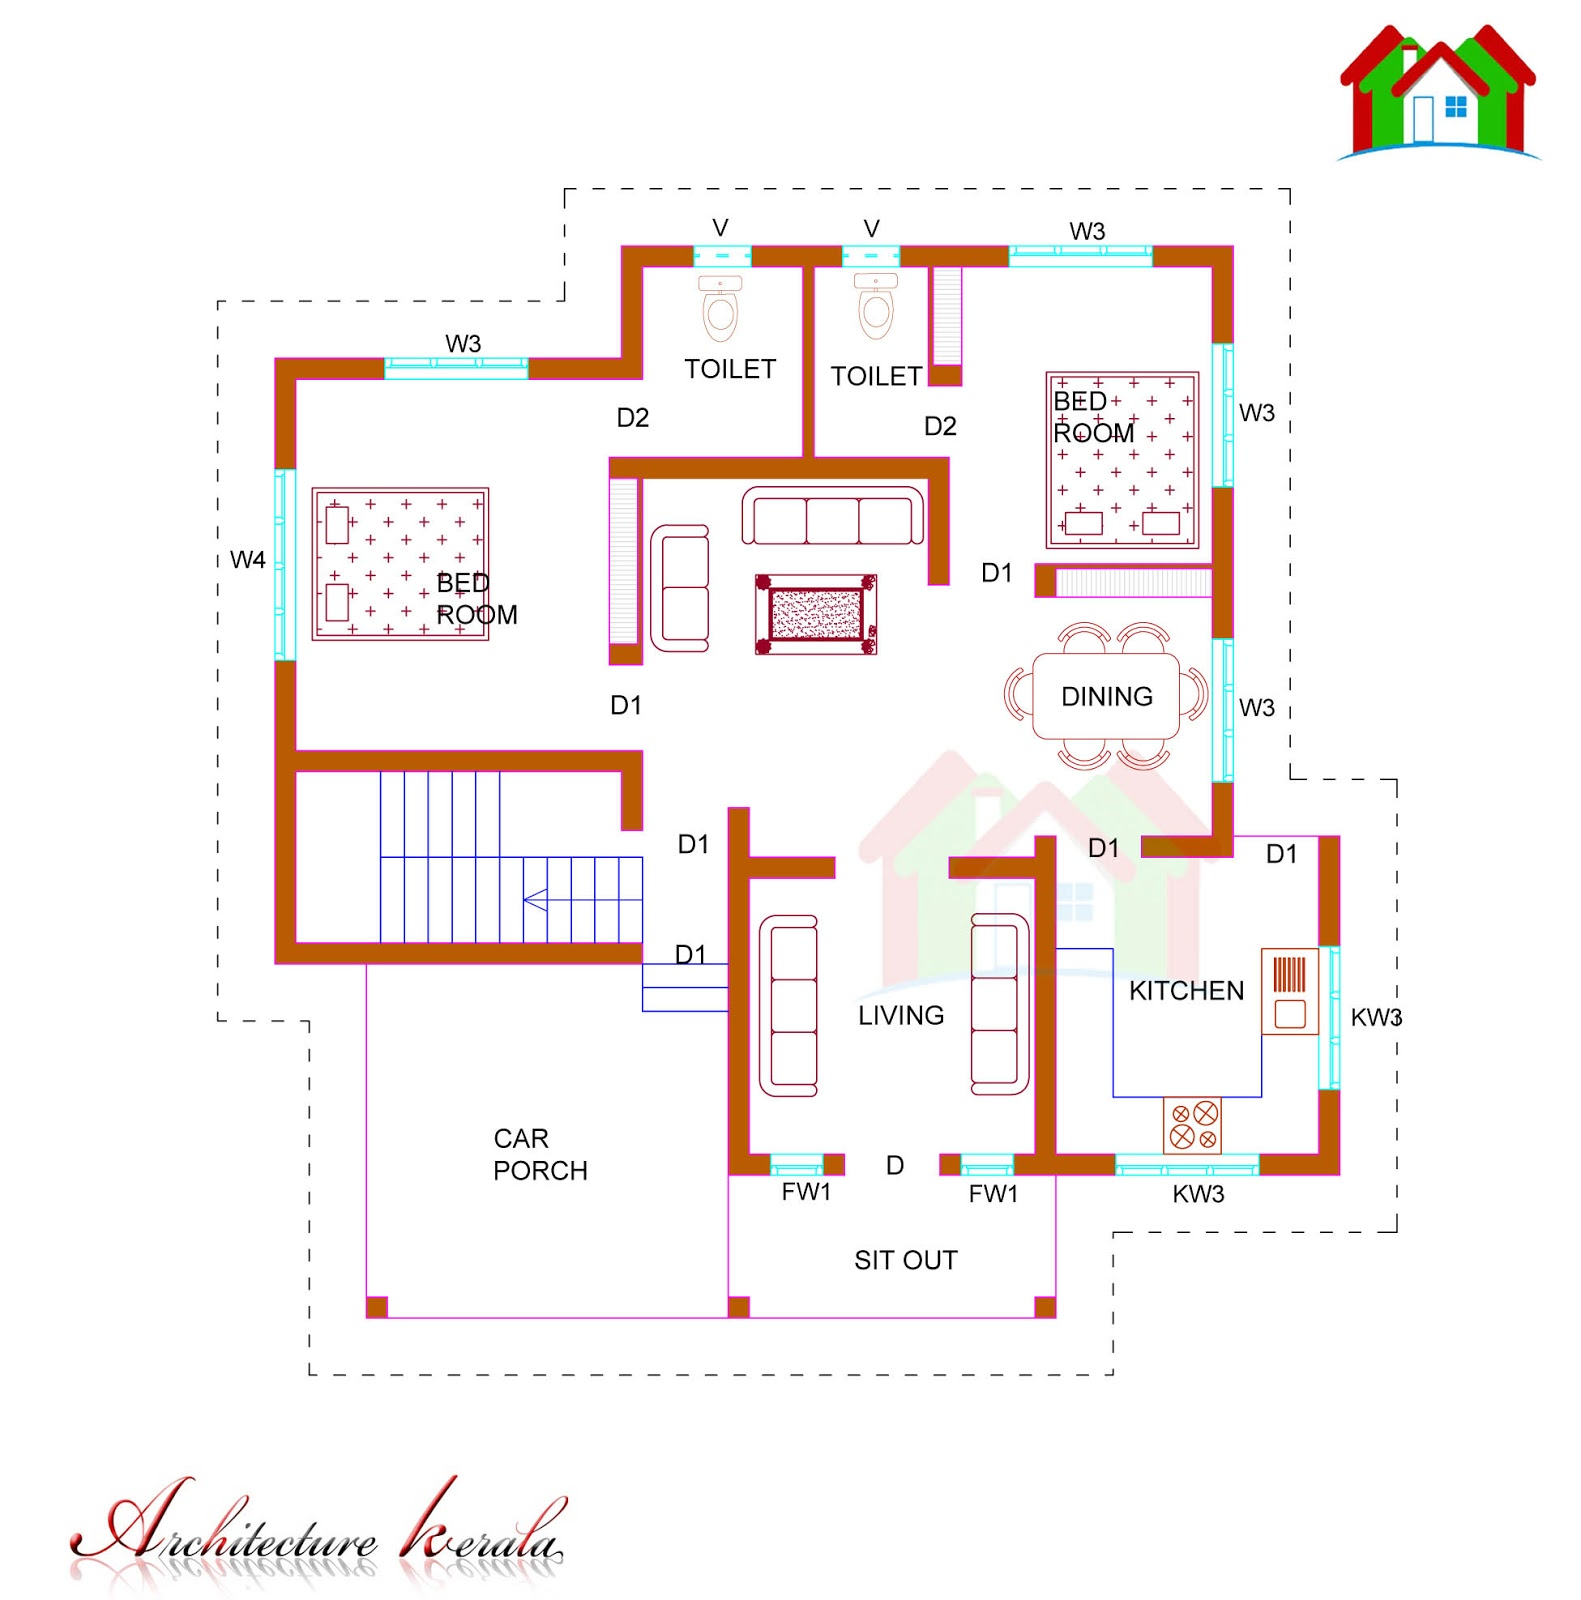 1000 square feet house plan kerala model